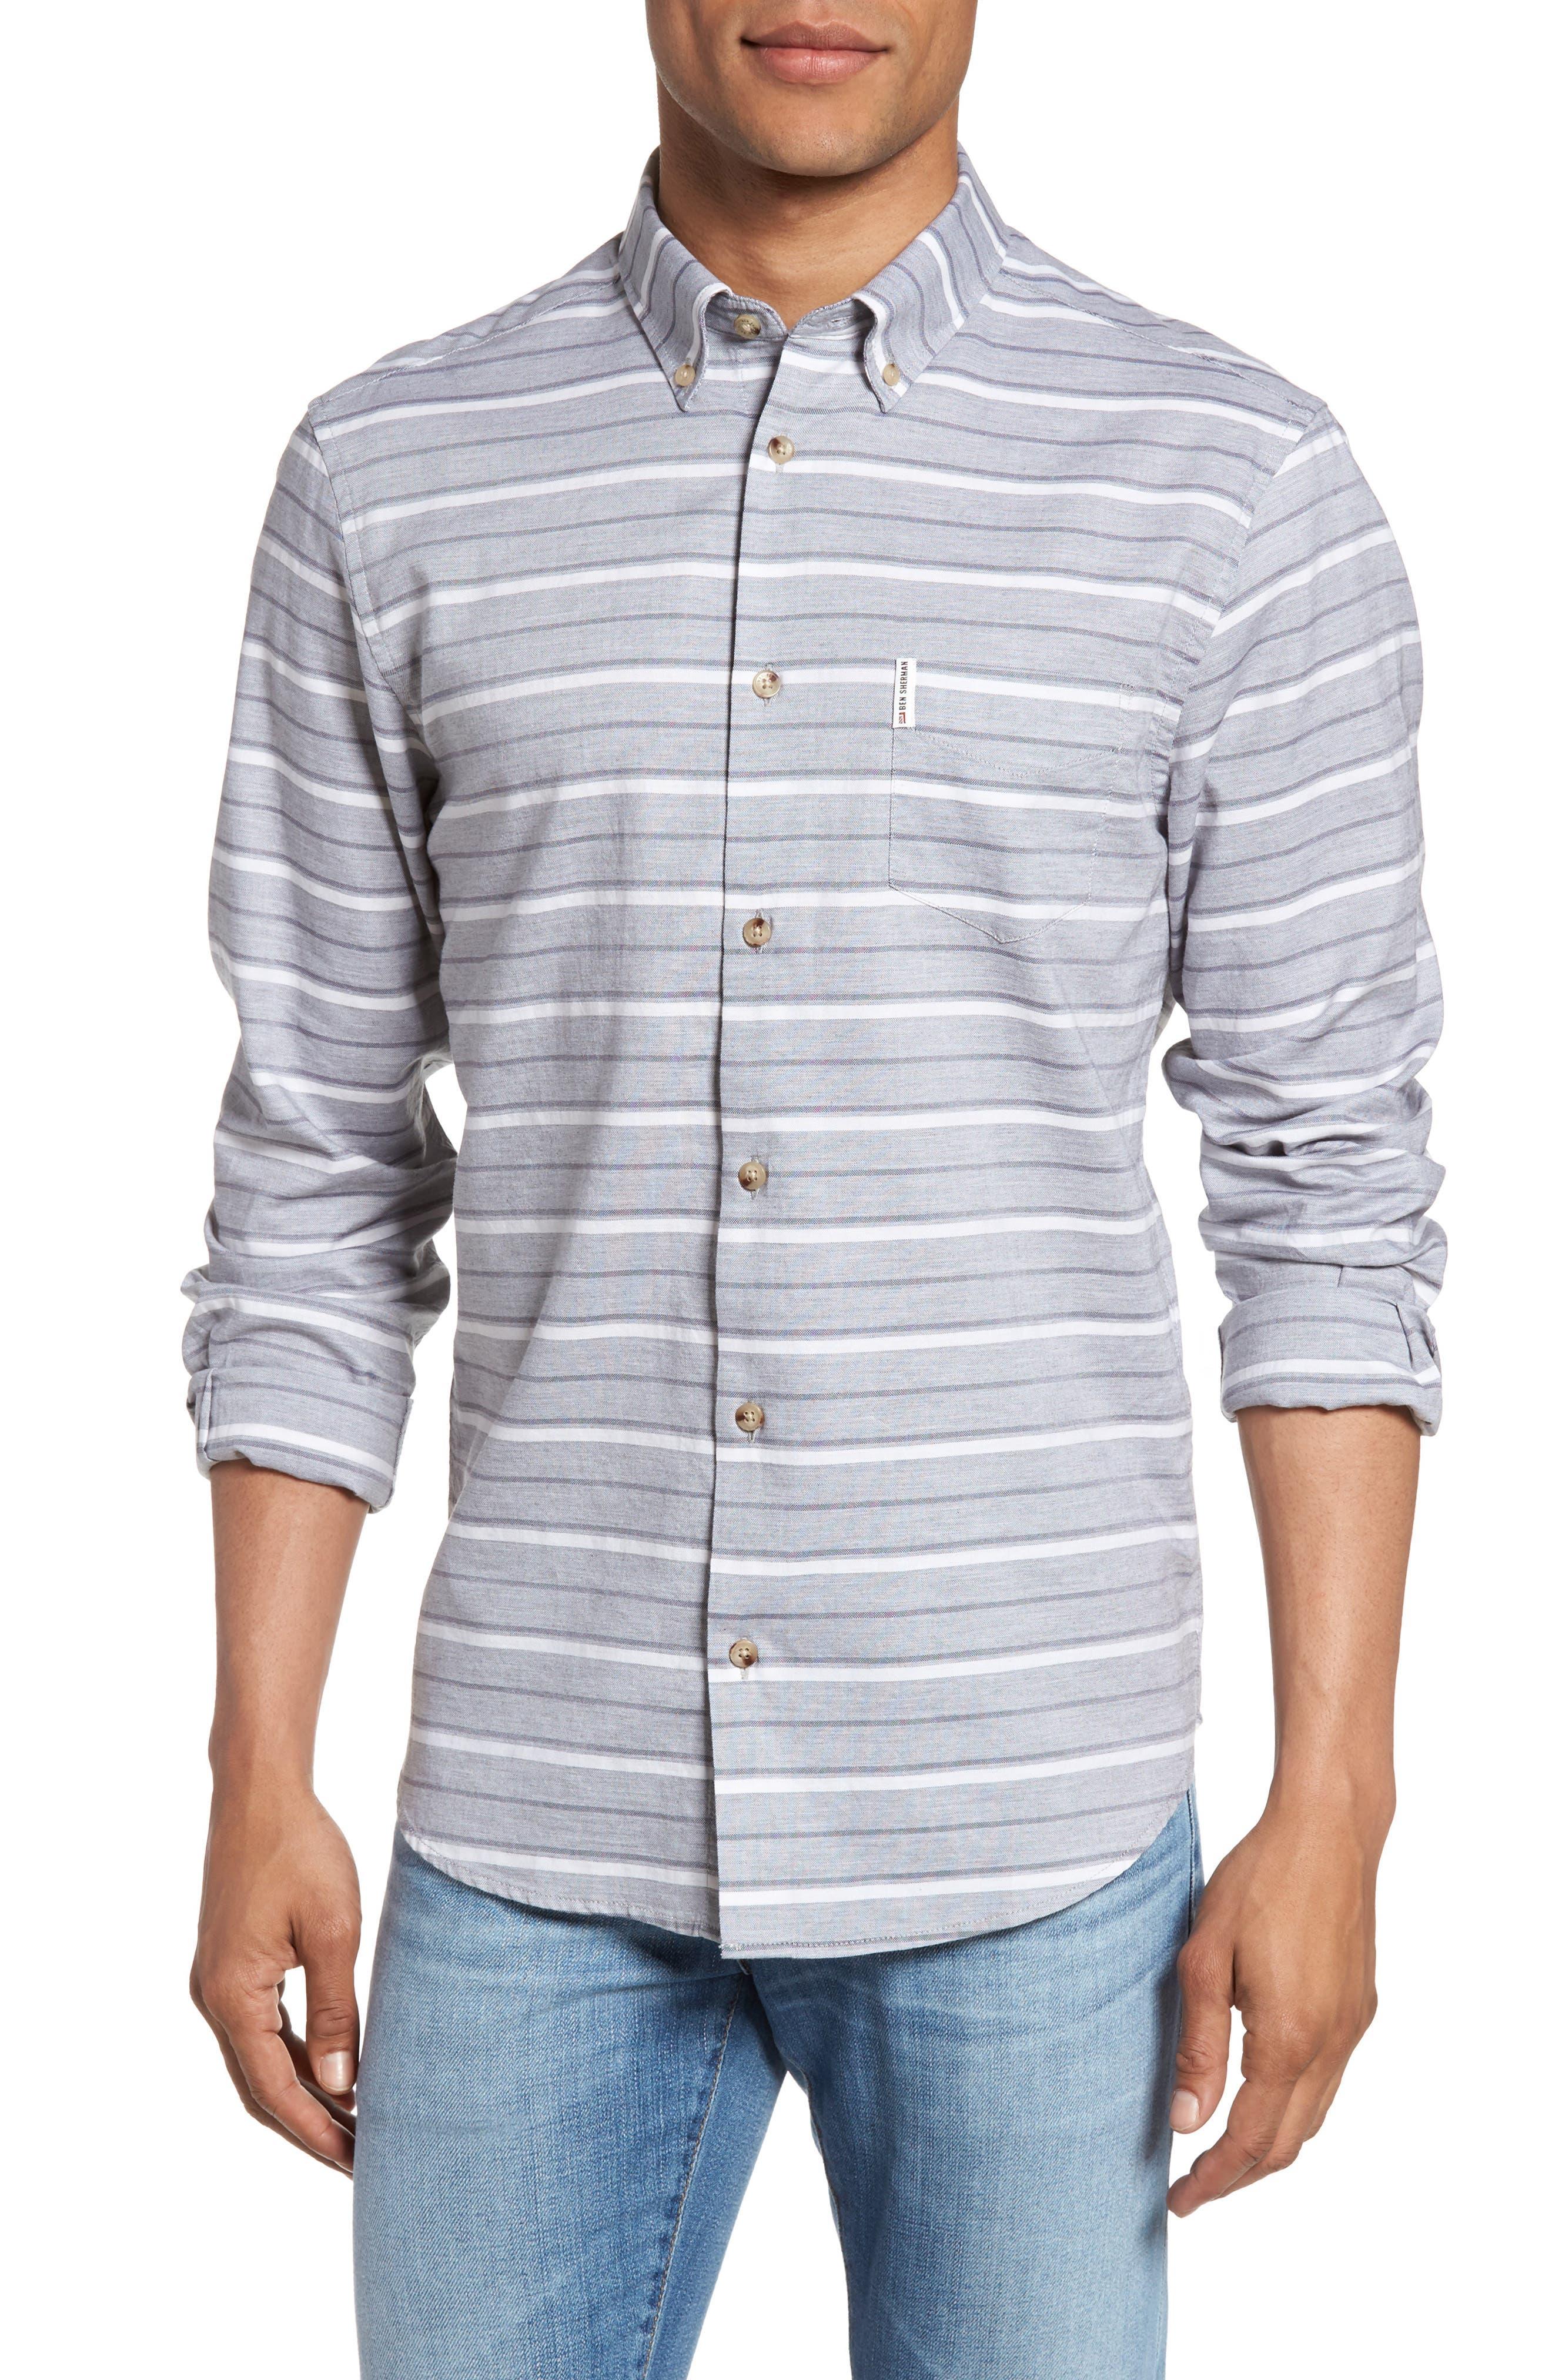 Tipping Horizontal Stripe Shirt,                         Main,                         color, 020